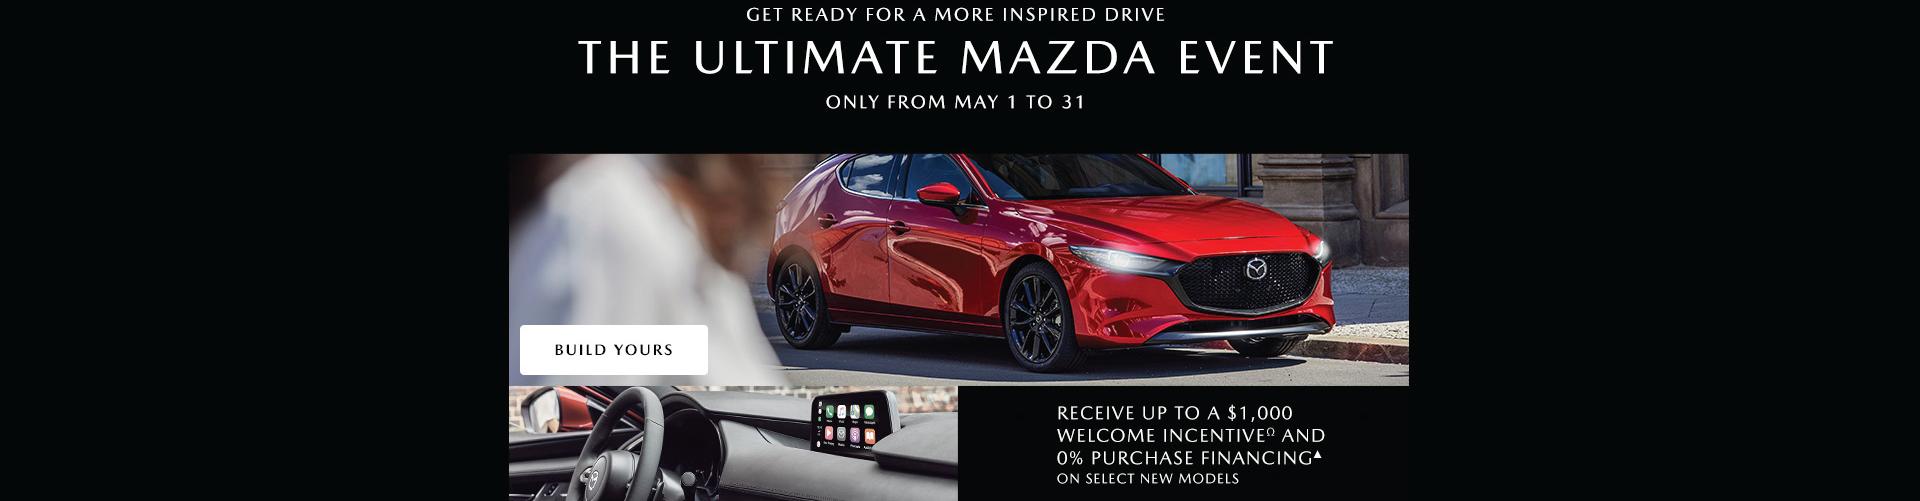 Updated: The Ultimate Mazda event_EN